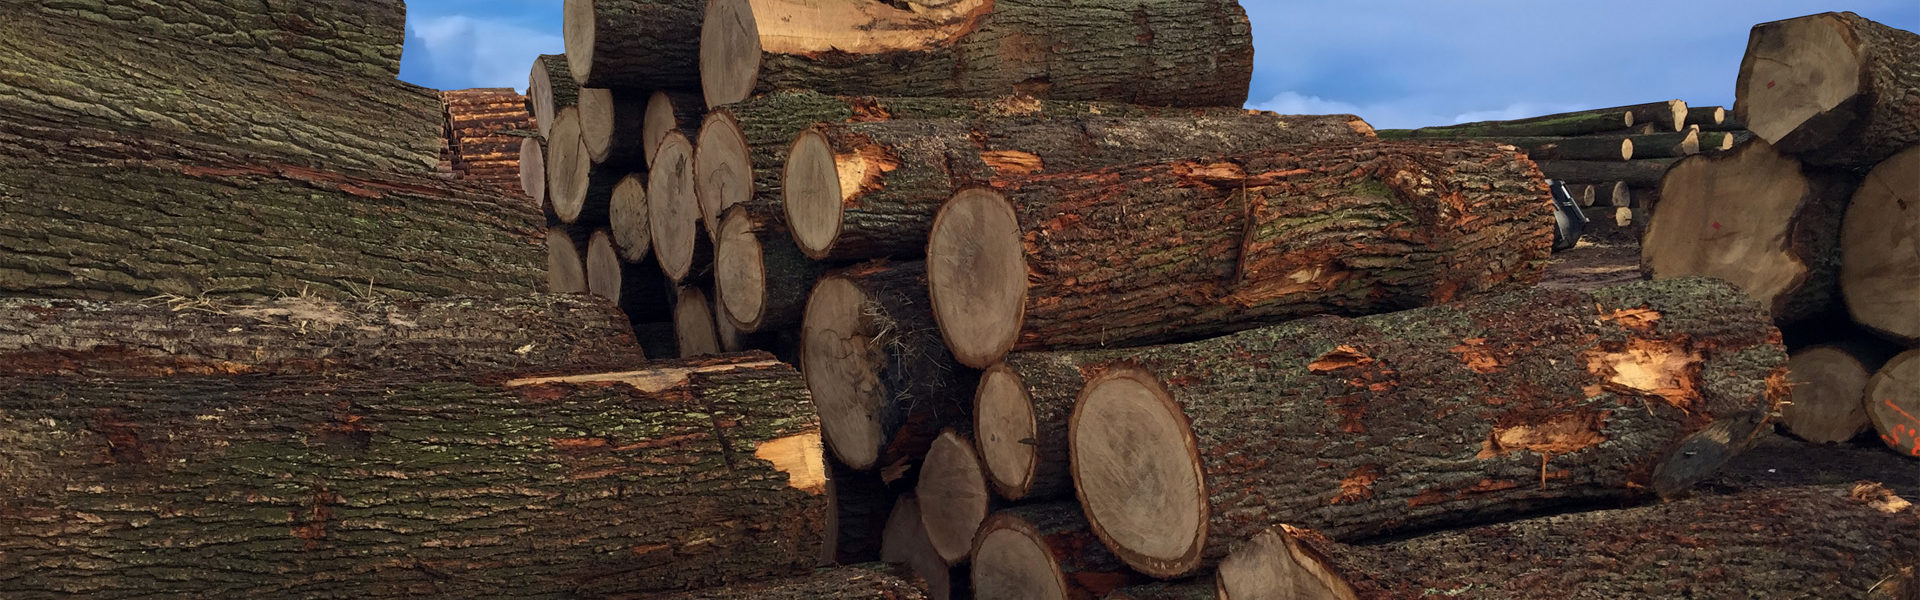 drewno okrąłe, logs